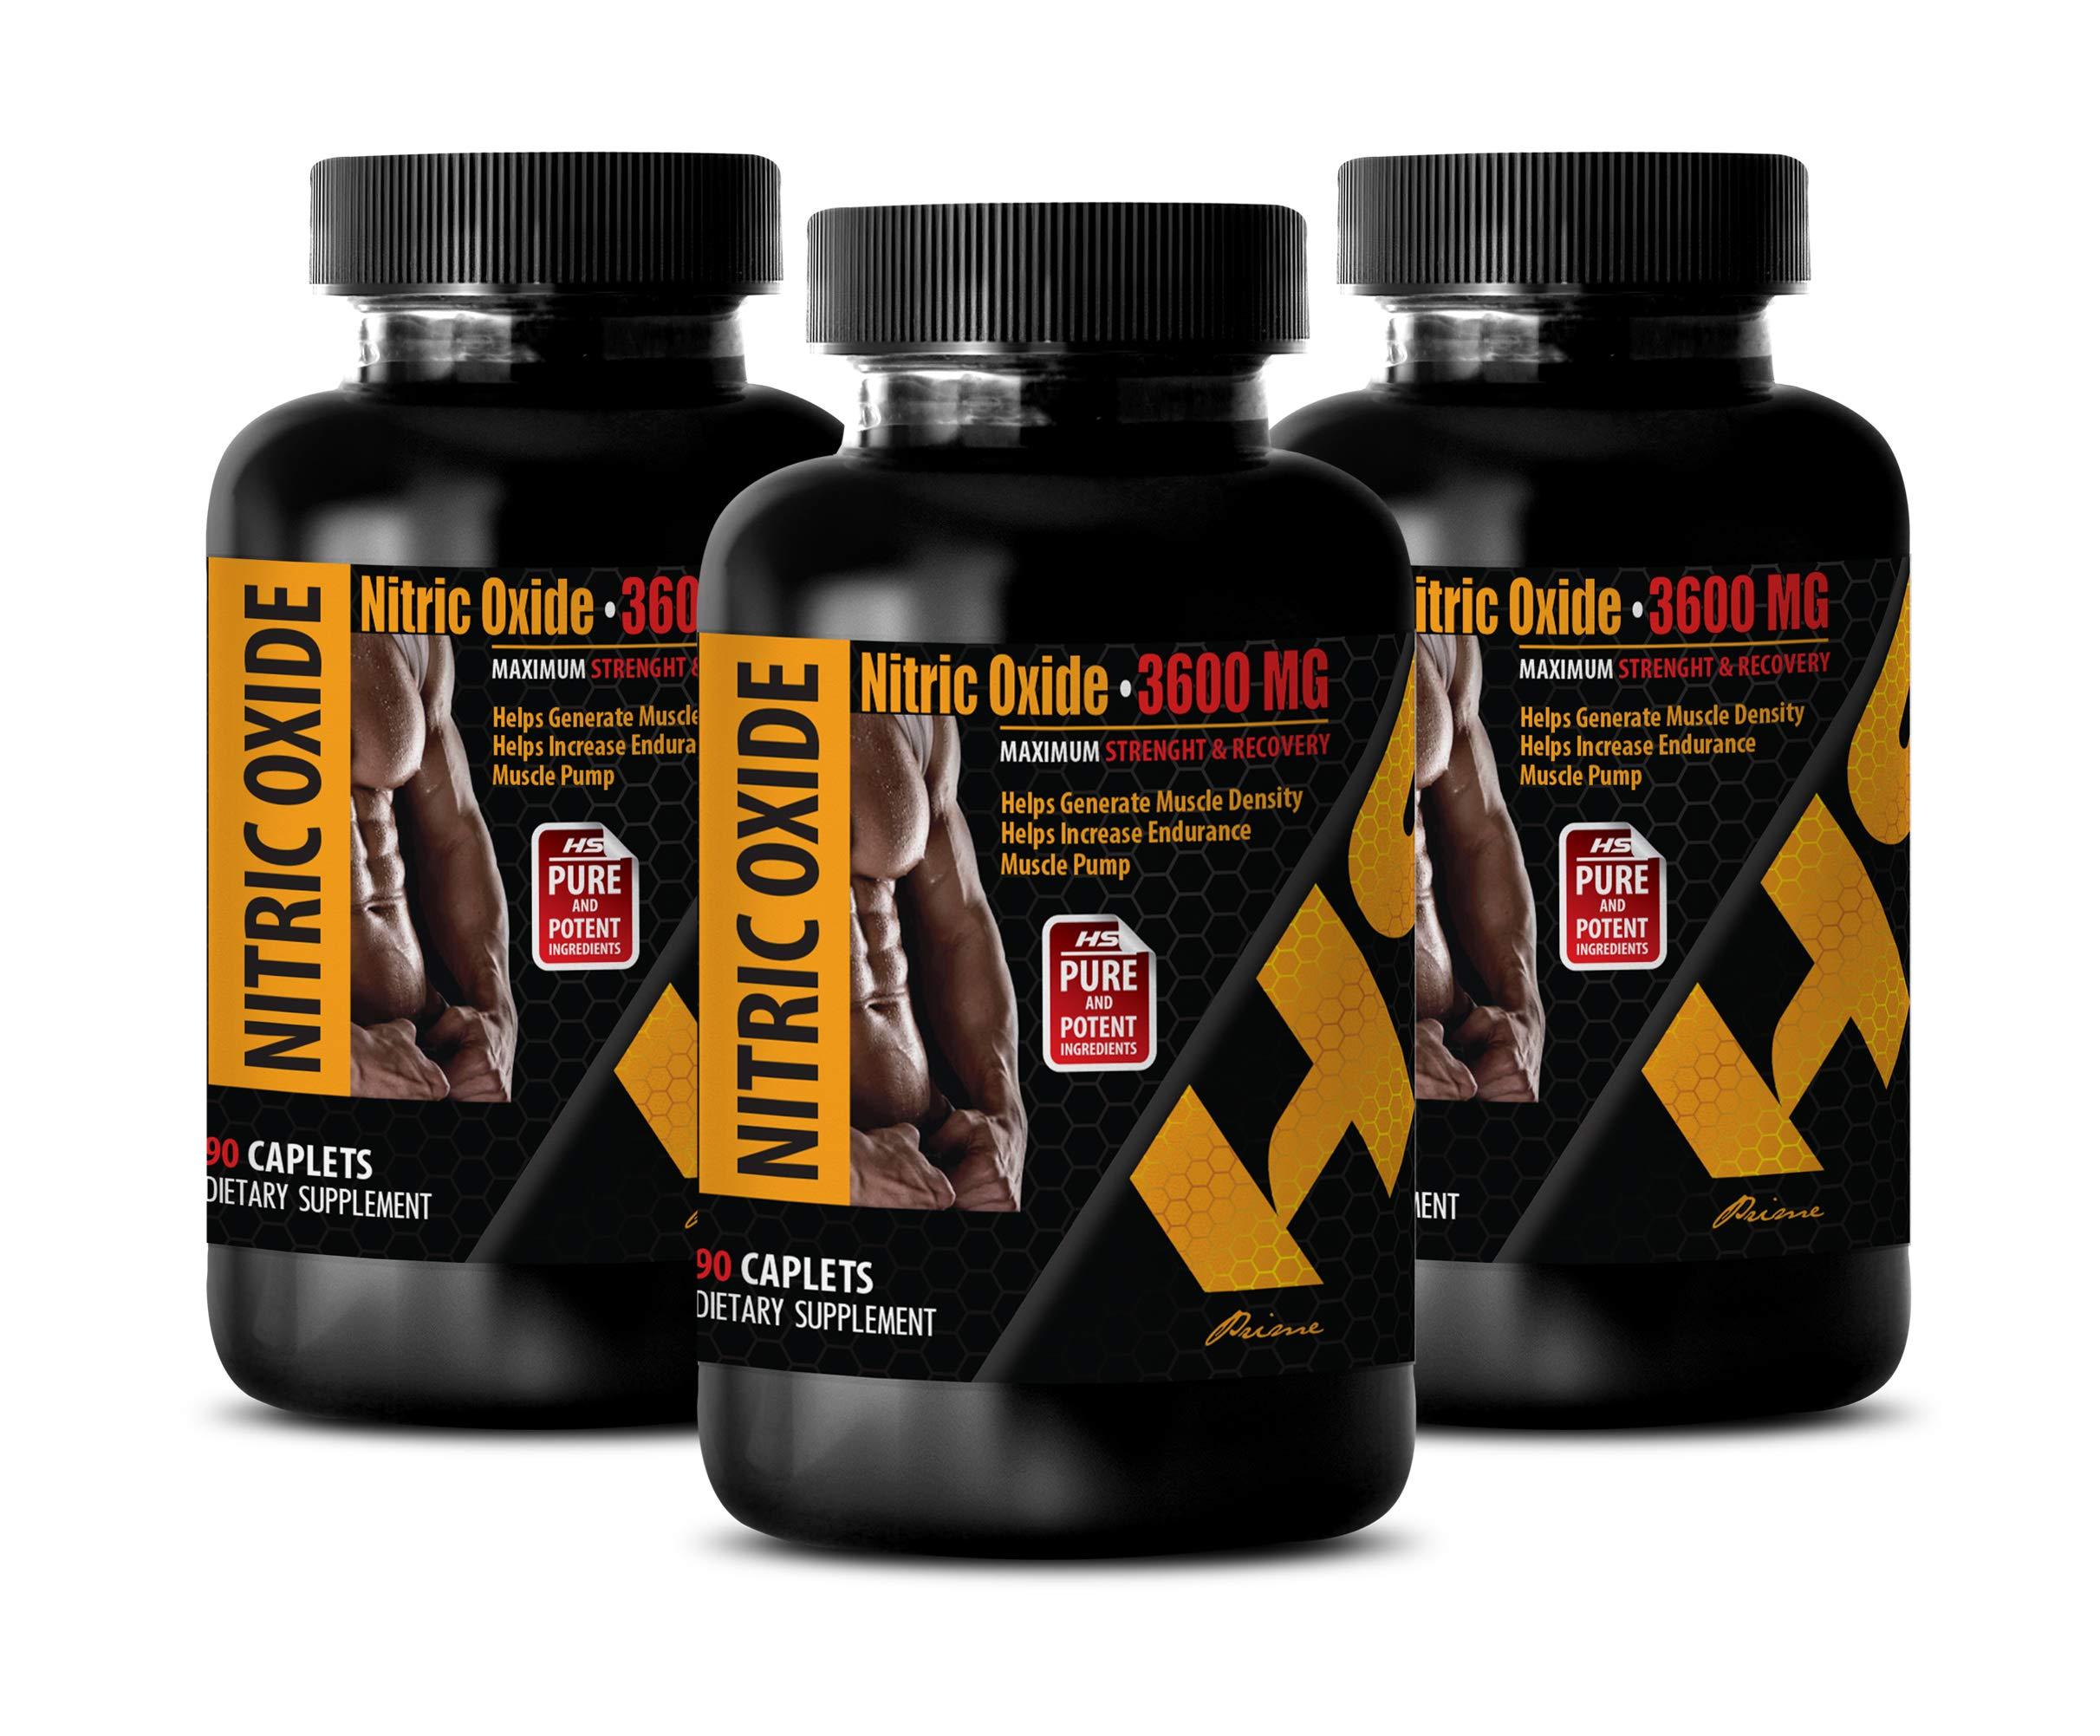 Bodybuilding Vitamins Men - Nitric Oxide 3600 MG - Maximum Strength & Recovery - Nitric Oxide Women - 3 Bottles 270 Caplets